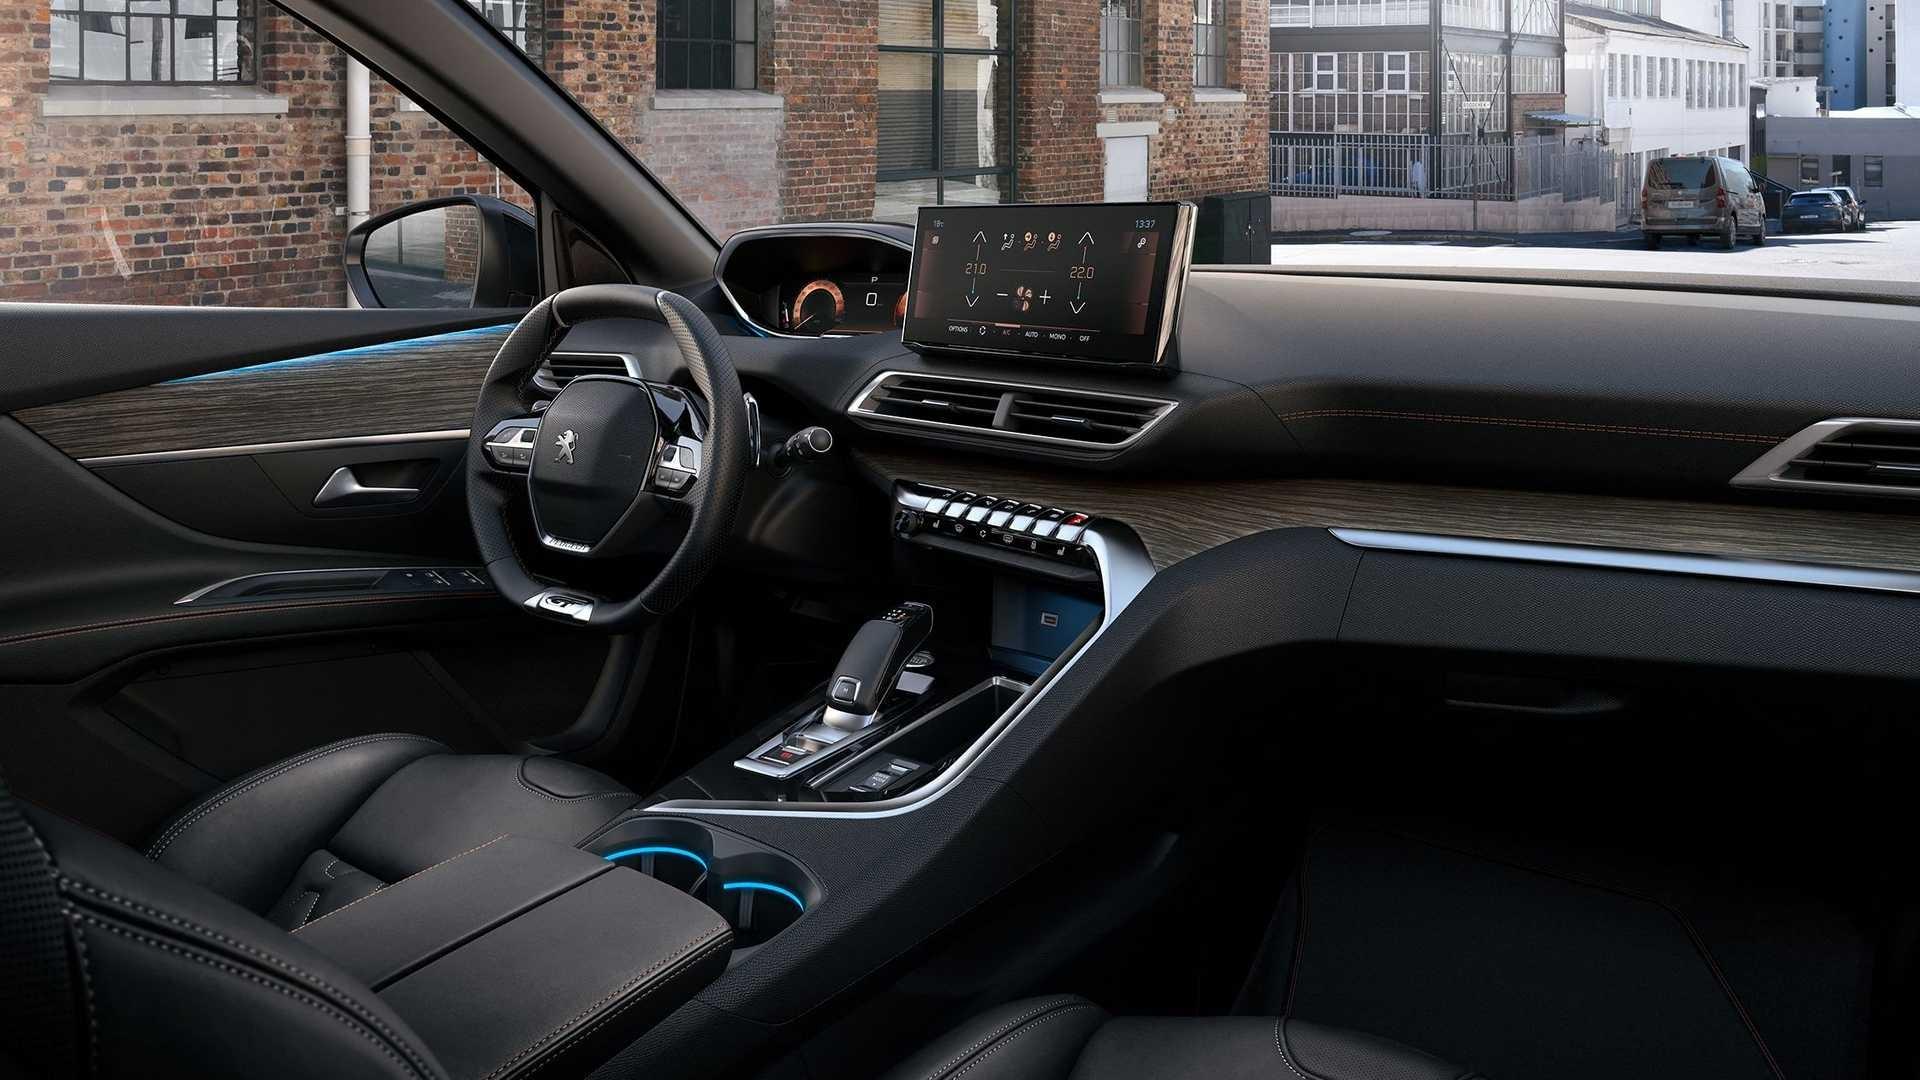 Peugeot 5008 2020 року